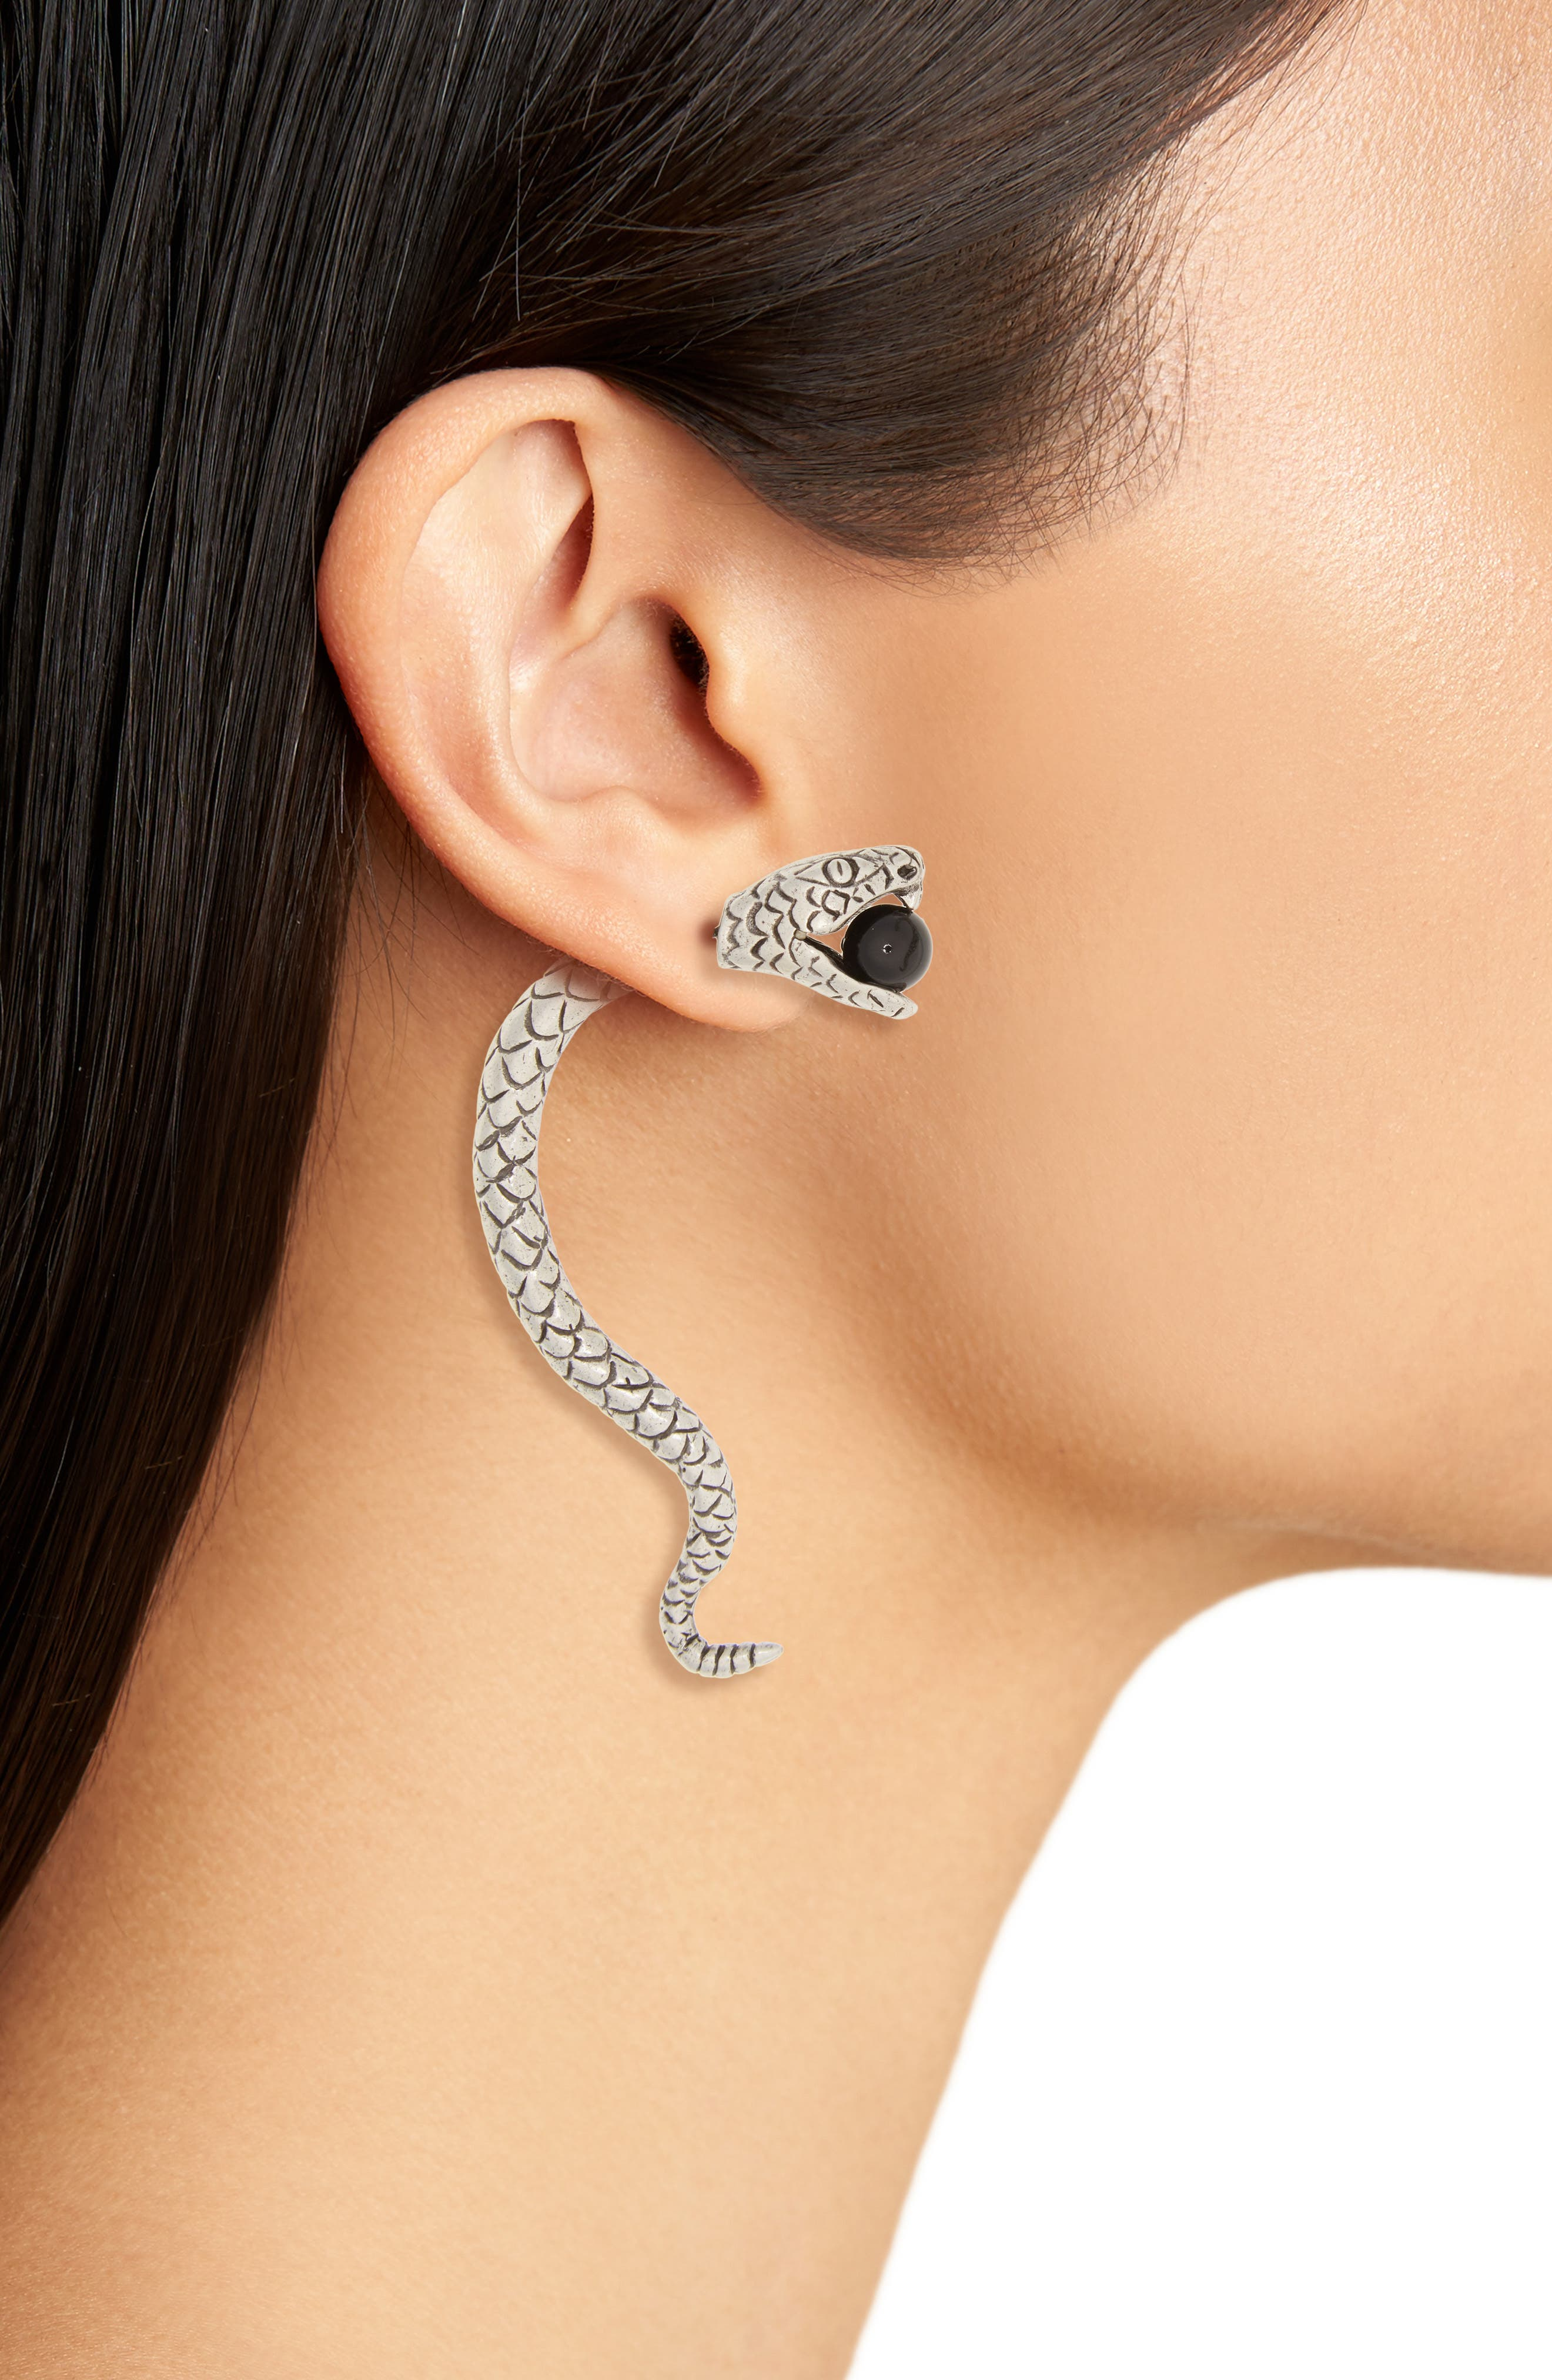 Serpent Front/Back Earrings,                             Alternate thumbnail 2, color,                             Gris/ Nero